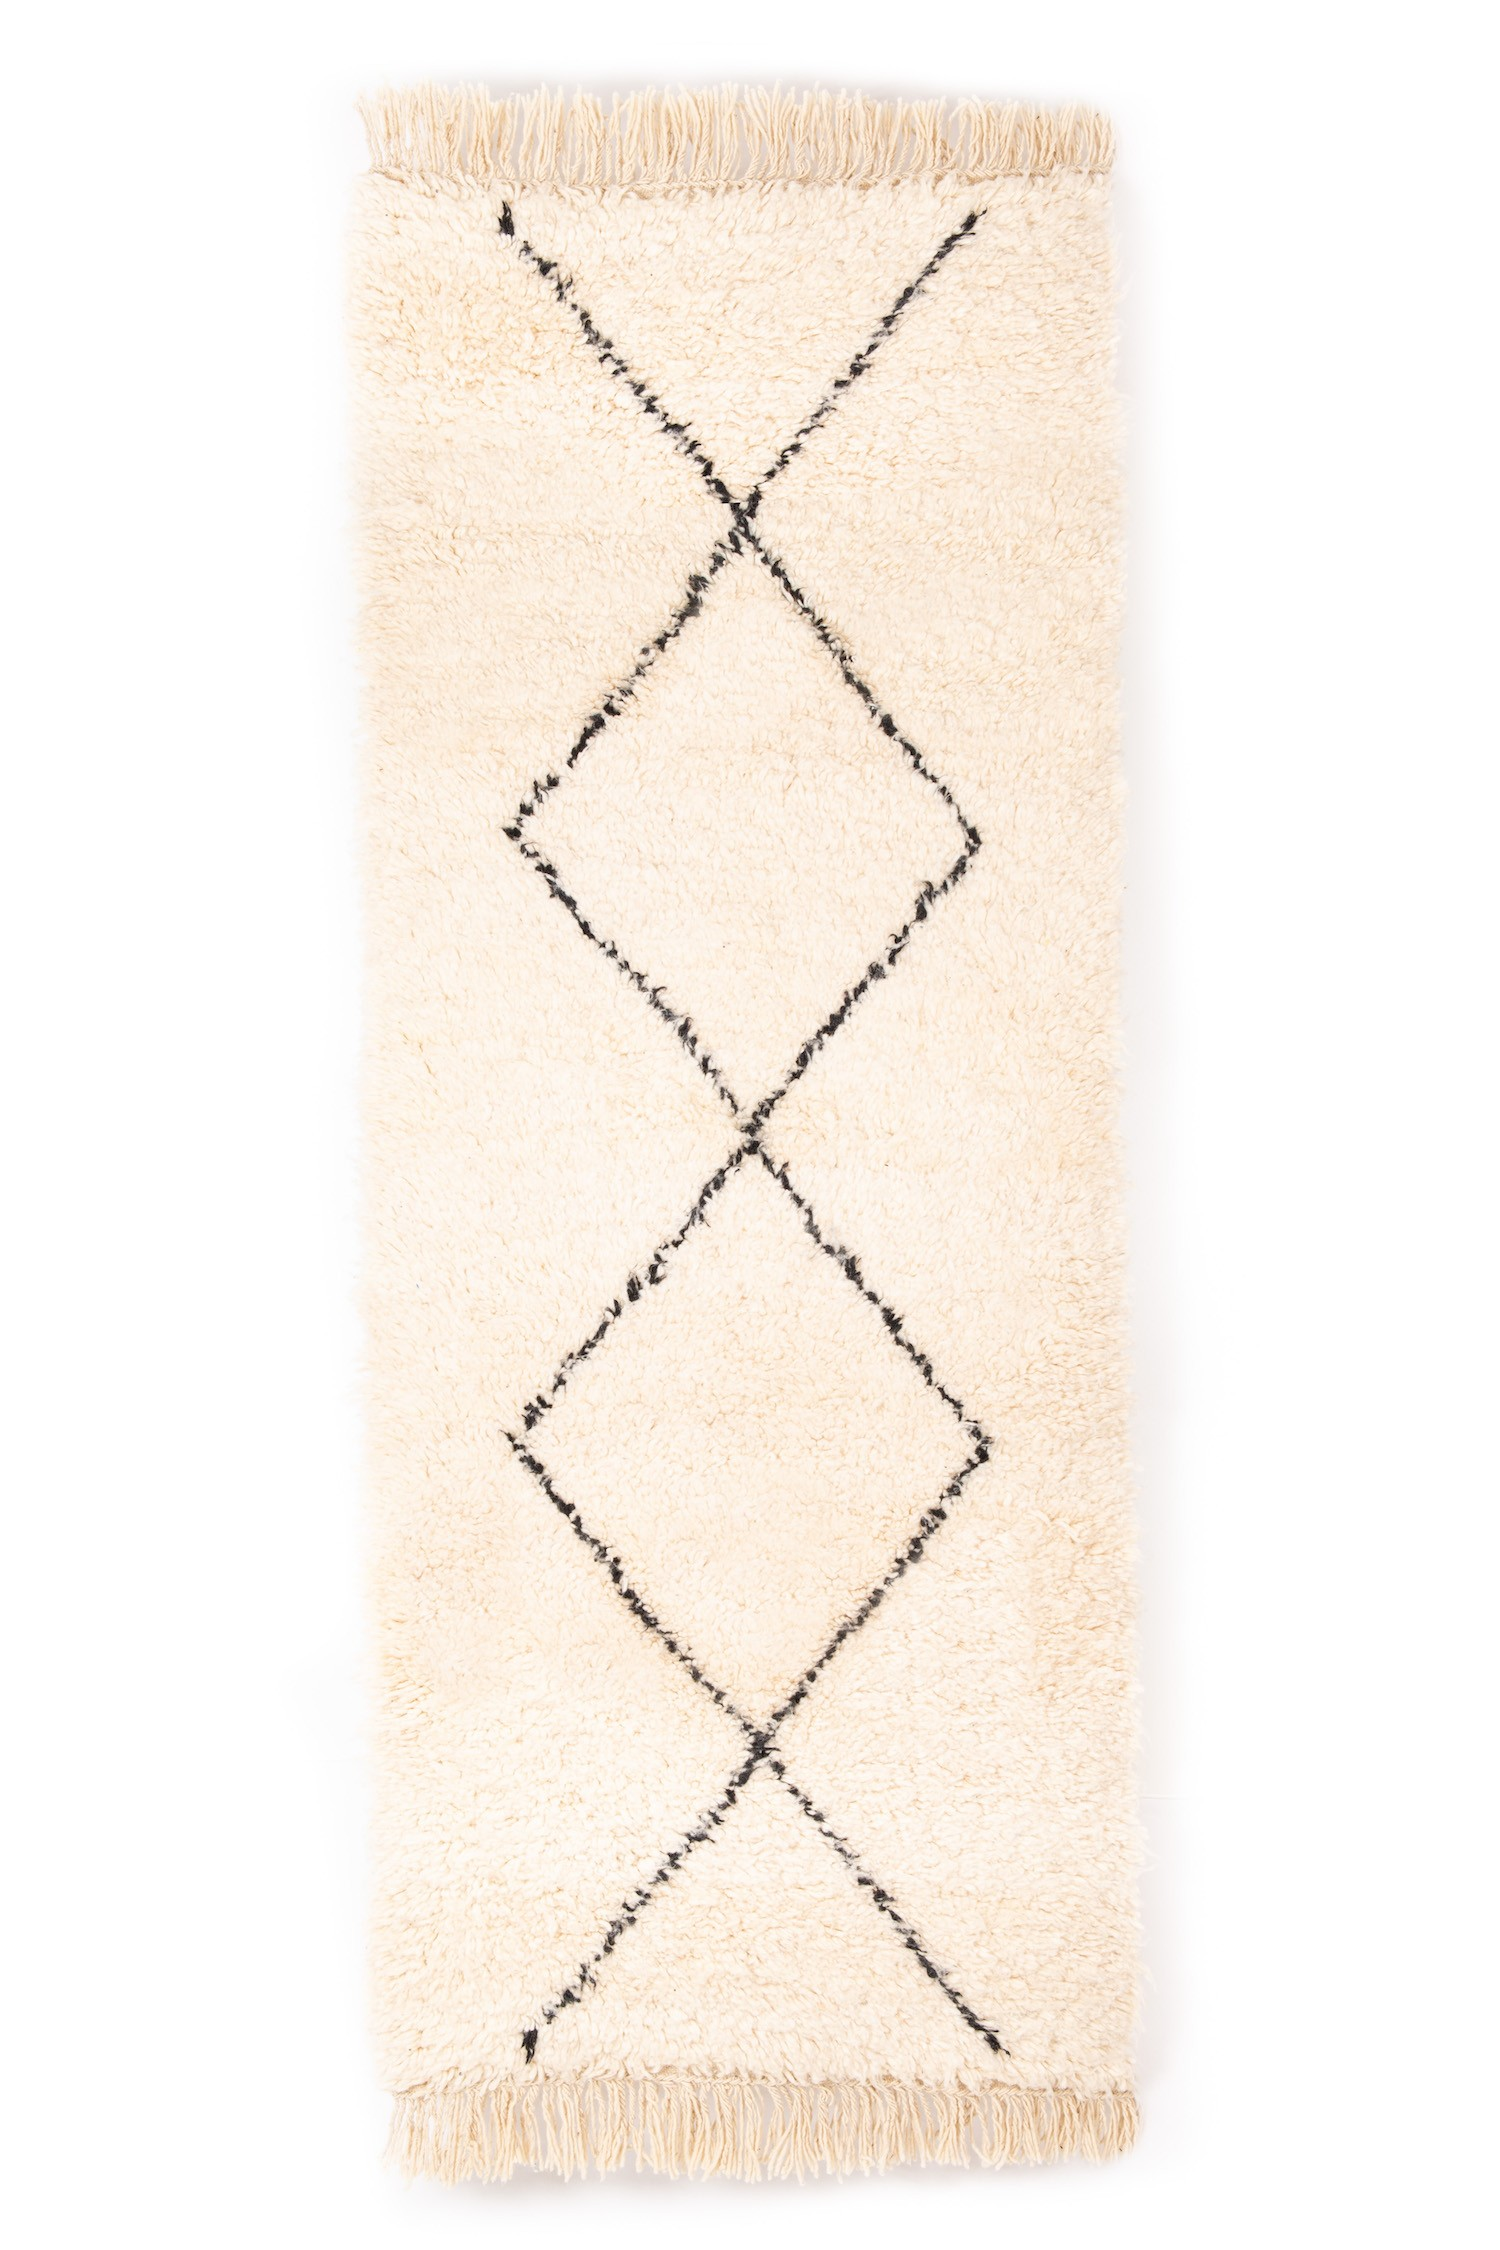 BENI OUARAIN RUG 205 x 84 cm